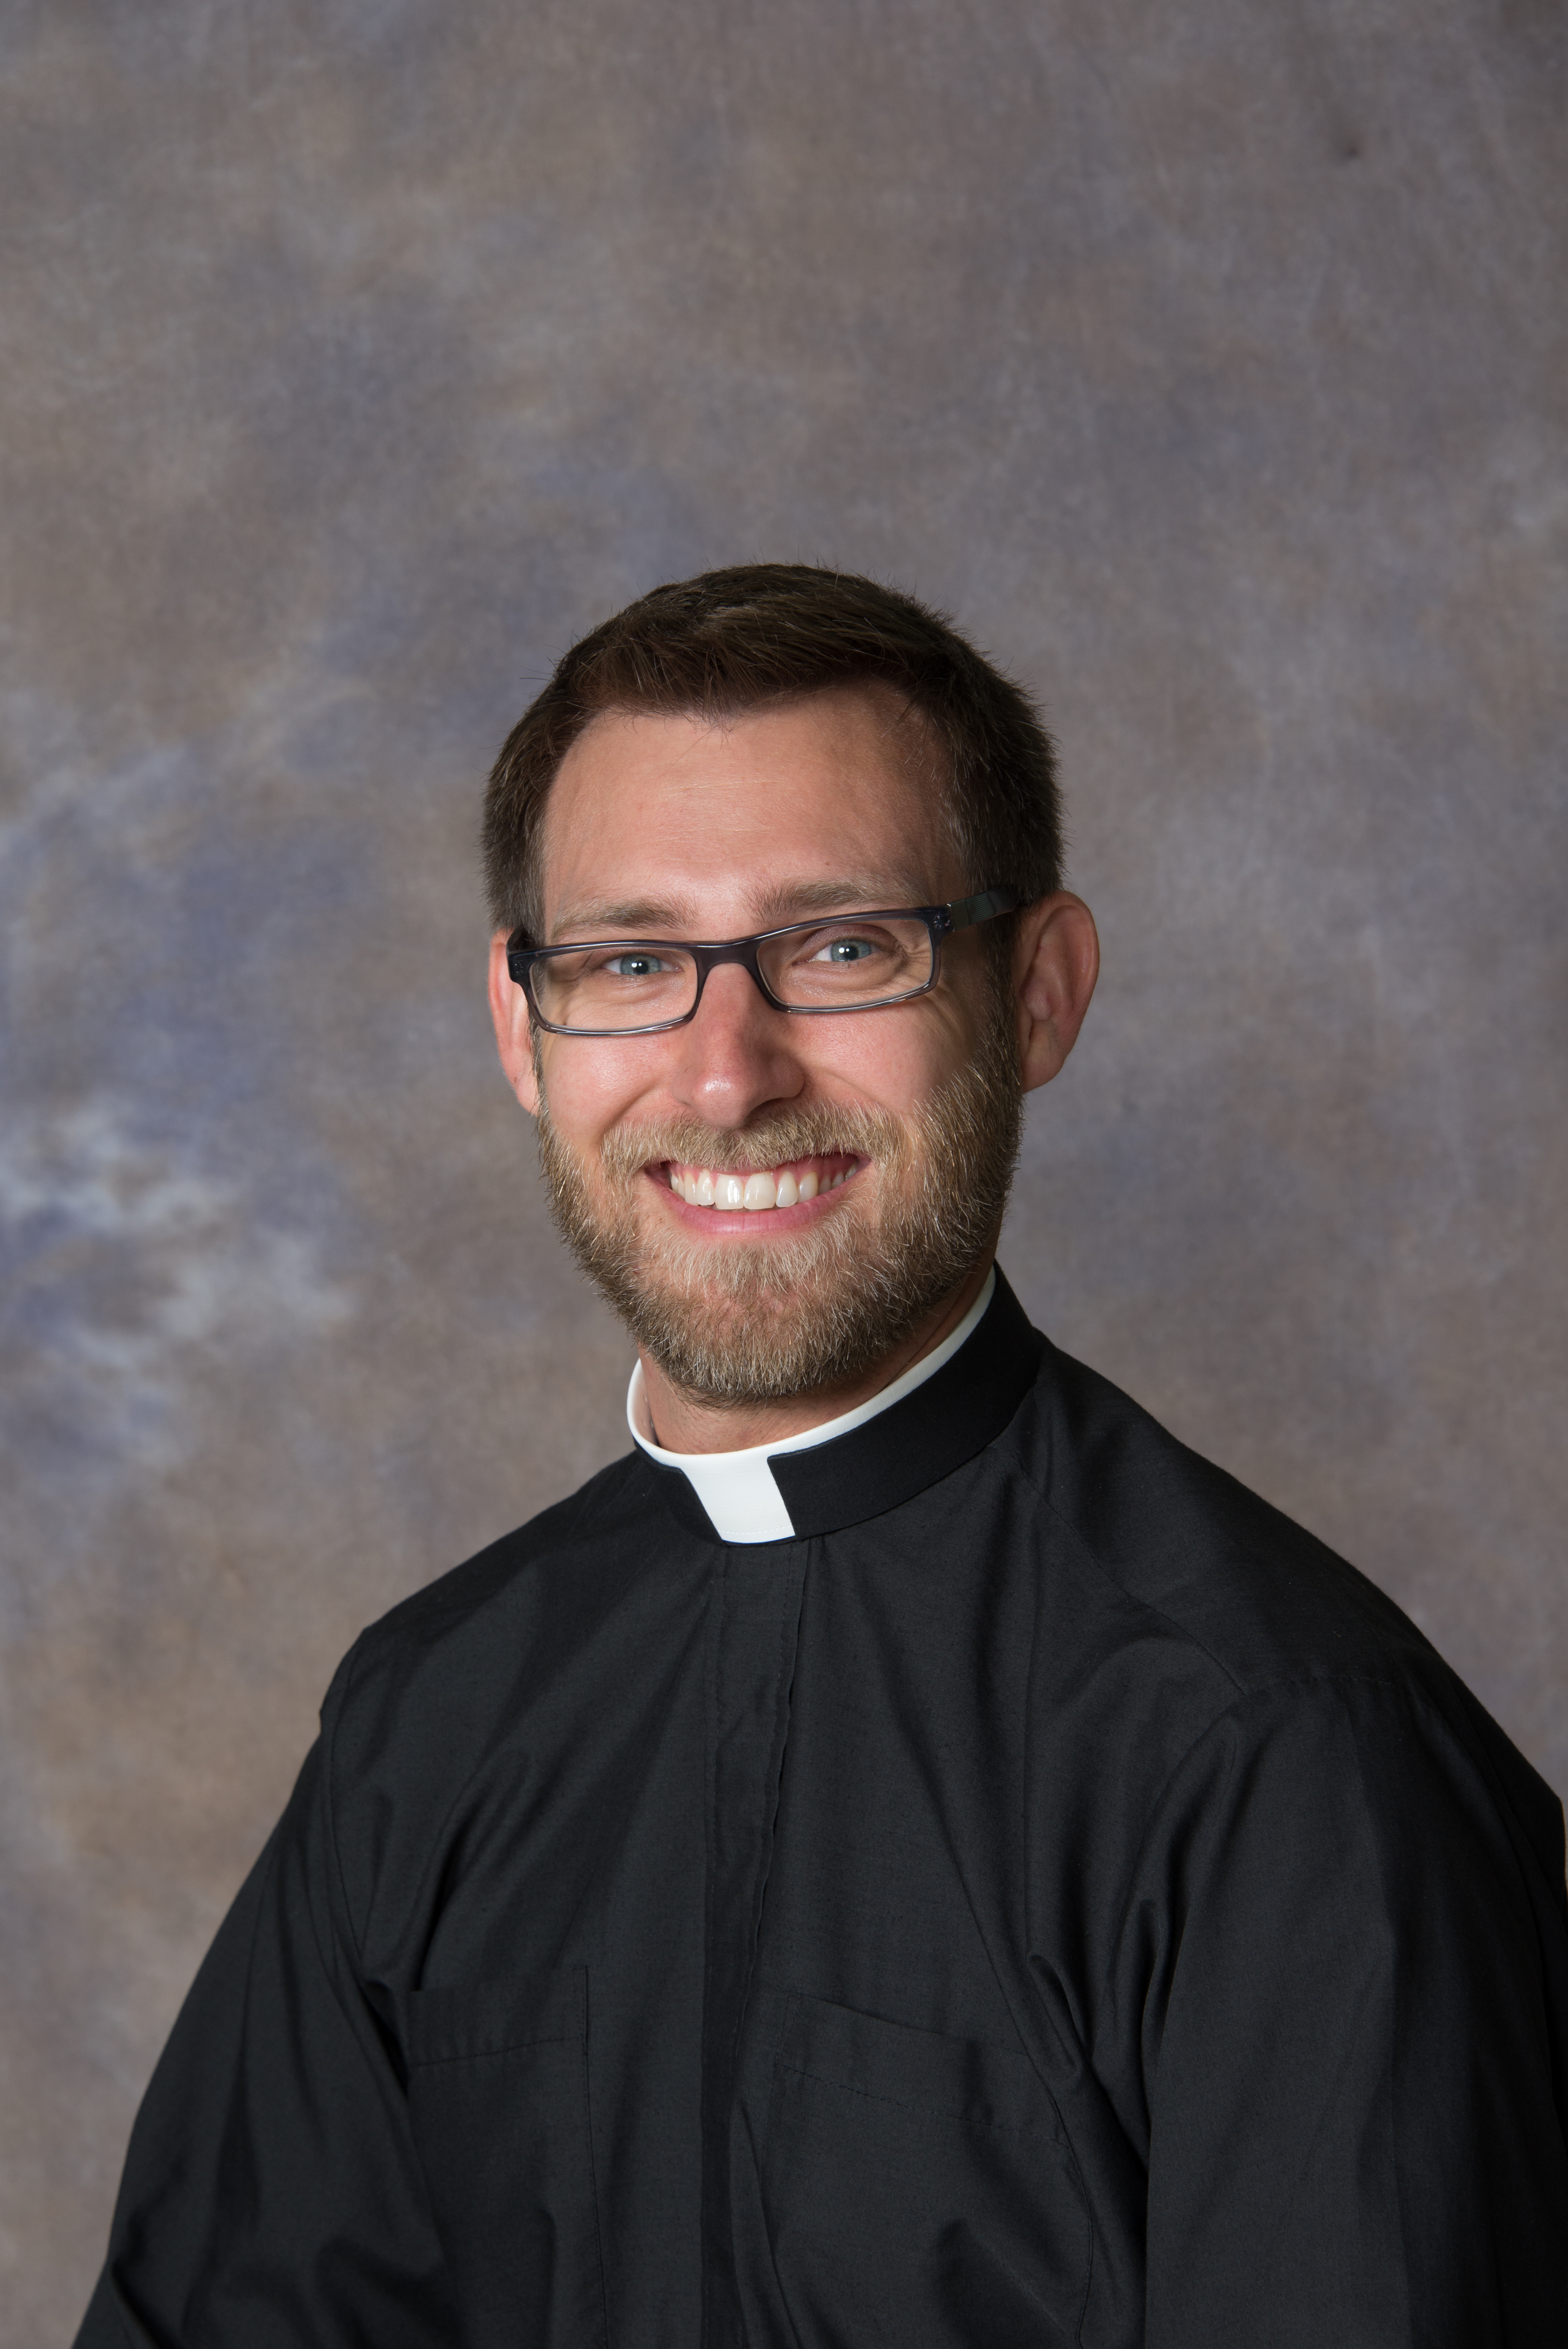 Rev. Aaron Roggow